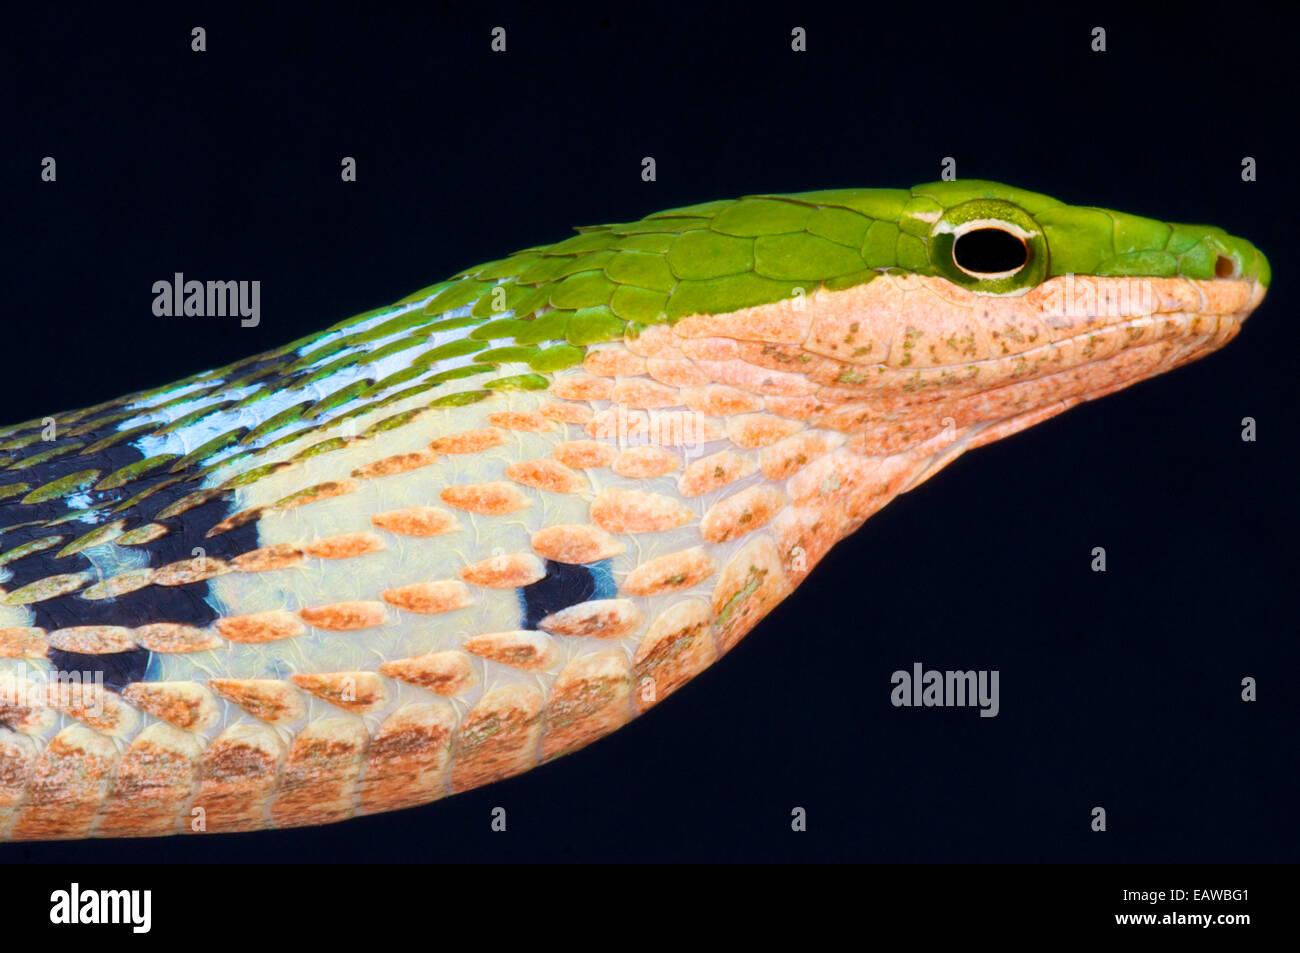 / Thelotornis kirtlandii serpent brindille Photo Stock